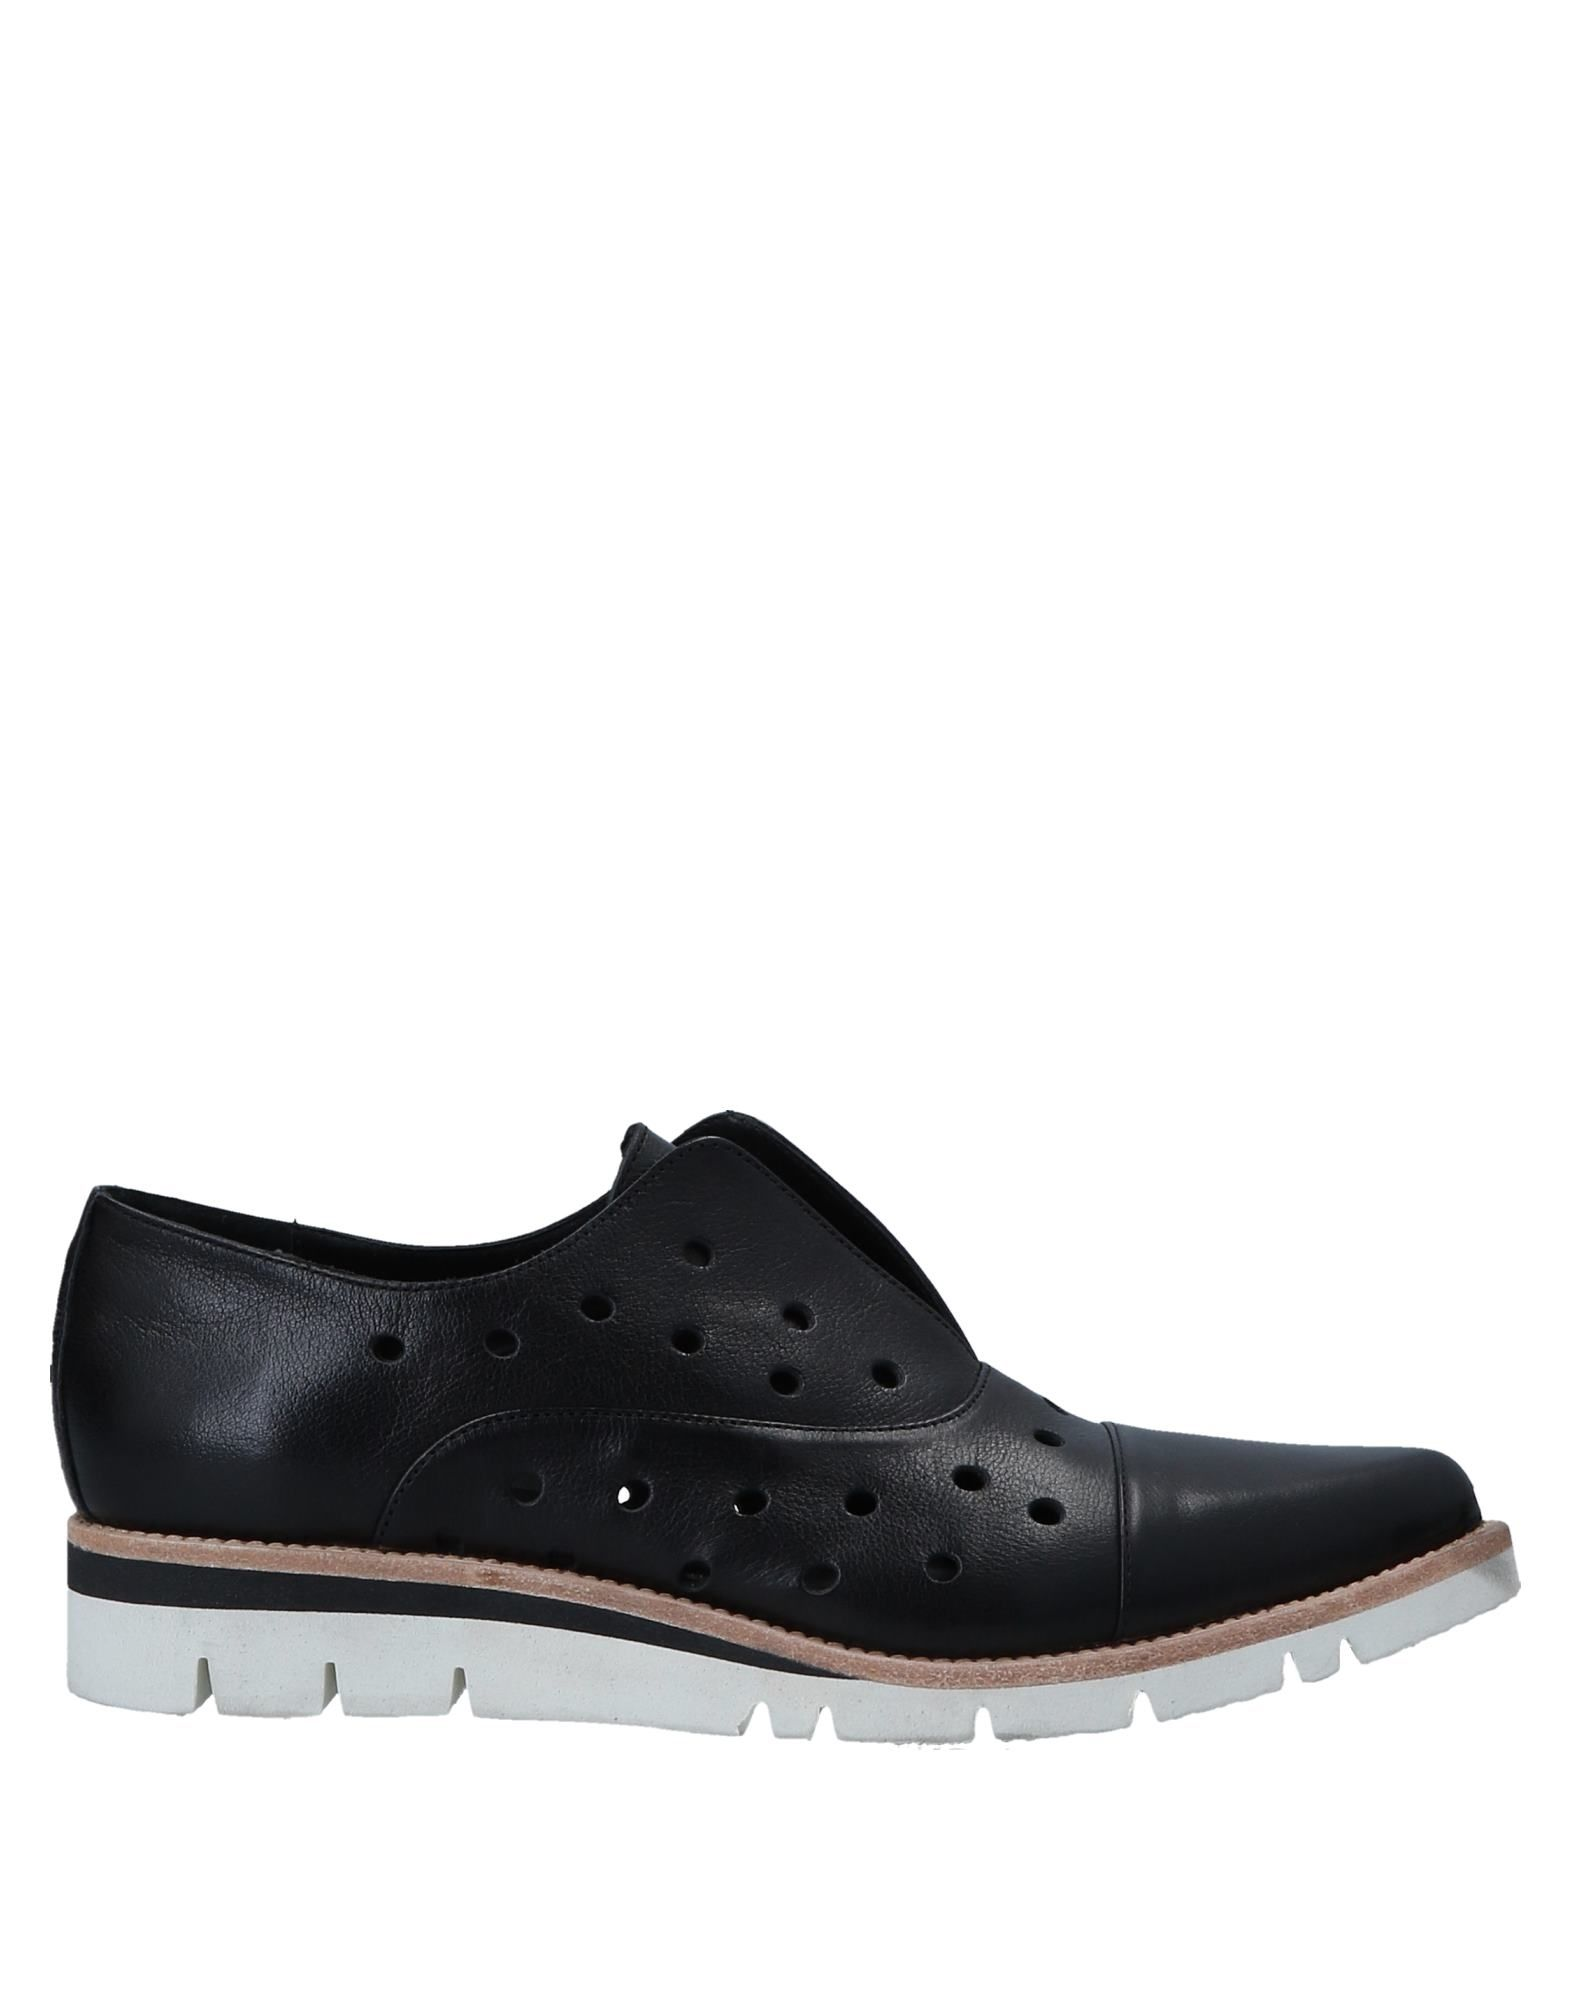 Gut um billige Schuhe Damen zu tragenLaura Bellariva Mokassins Damen Schuhe  11556613KG 27f0f4